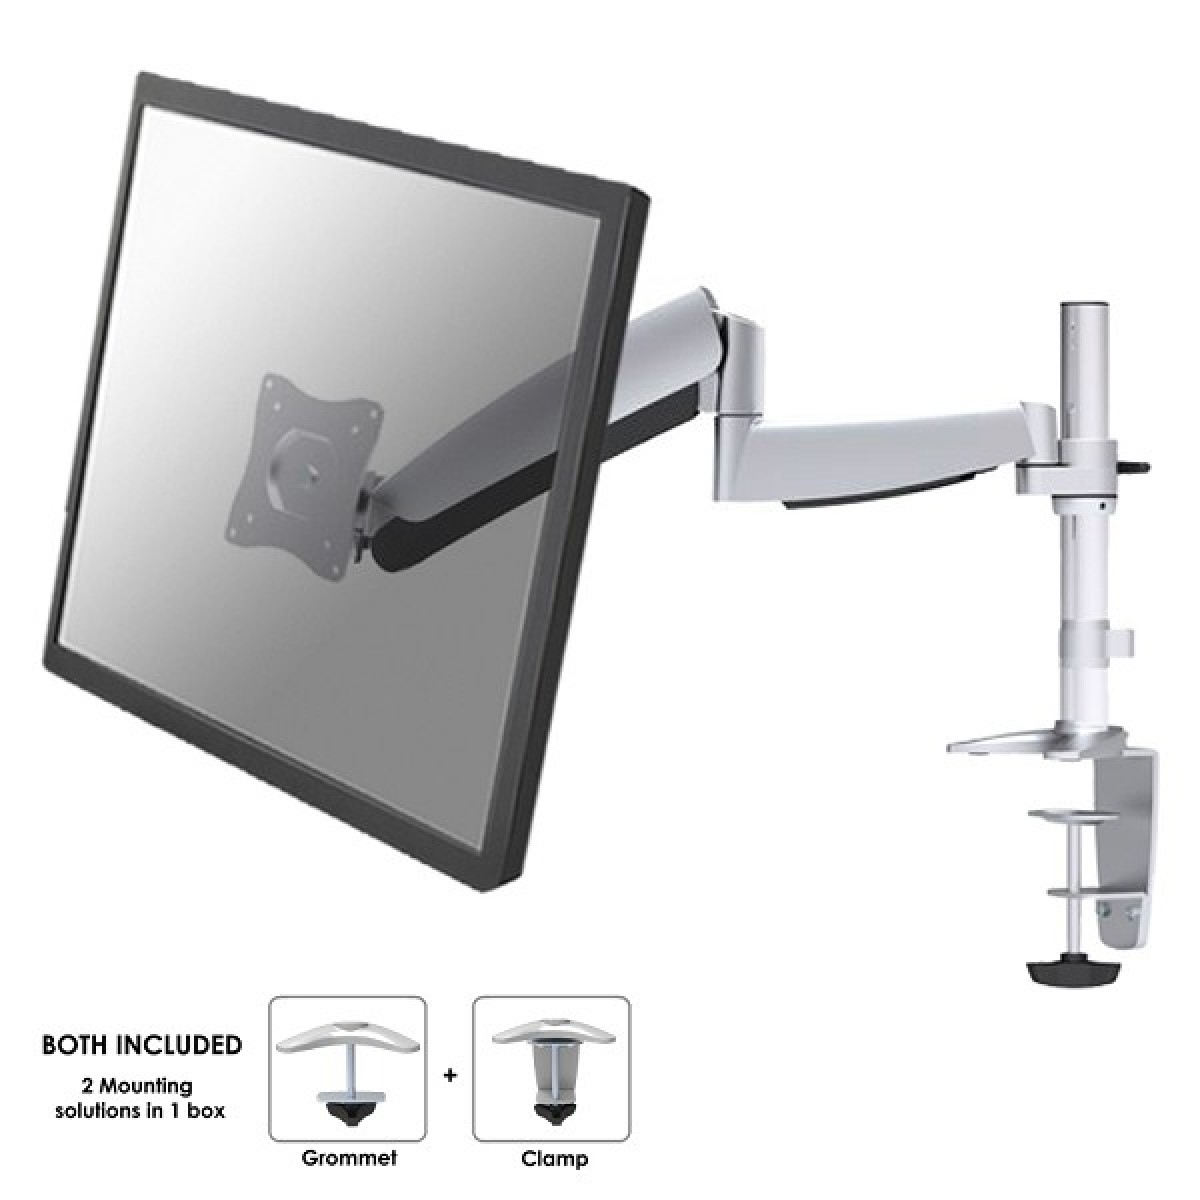 Newstar Desk Mount 10 24 Clamp Grommet 1 Screen 3